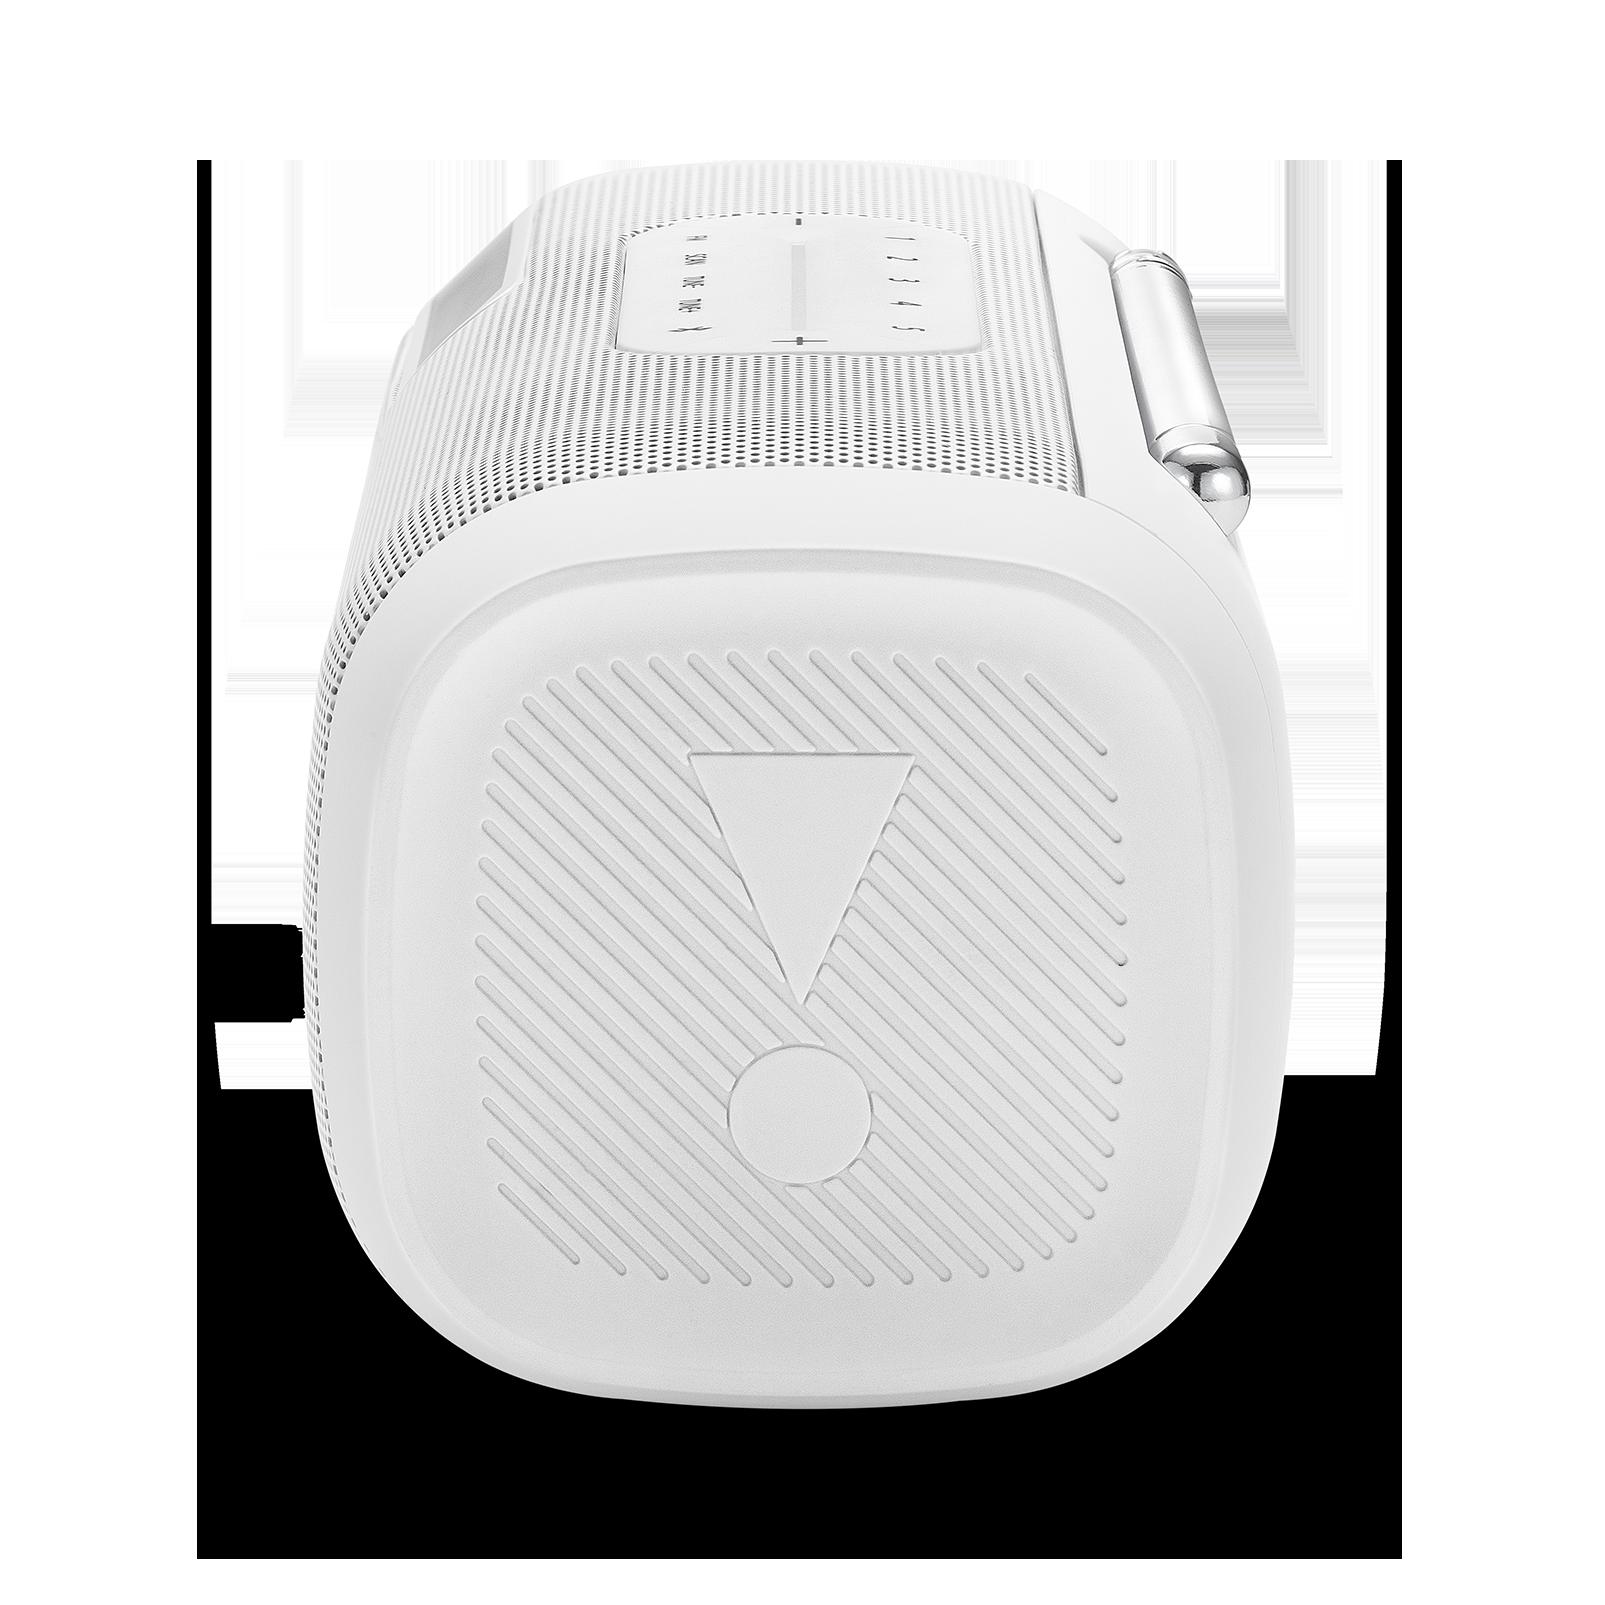 JBL Tuner FM - White - Portable Bluetooth Speaker with FM radio - Detailshot 1